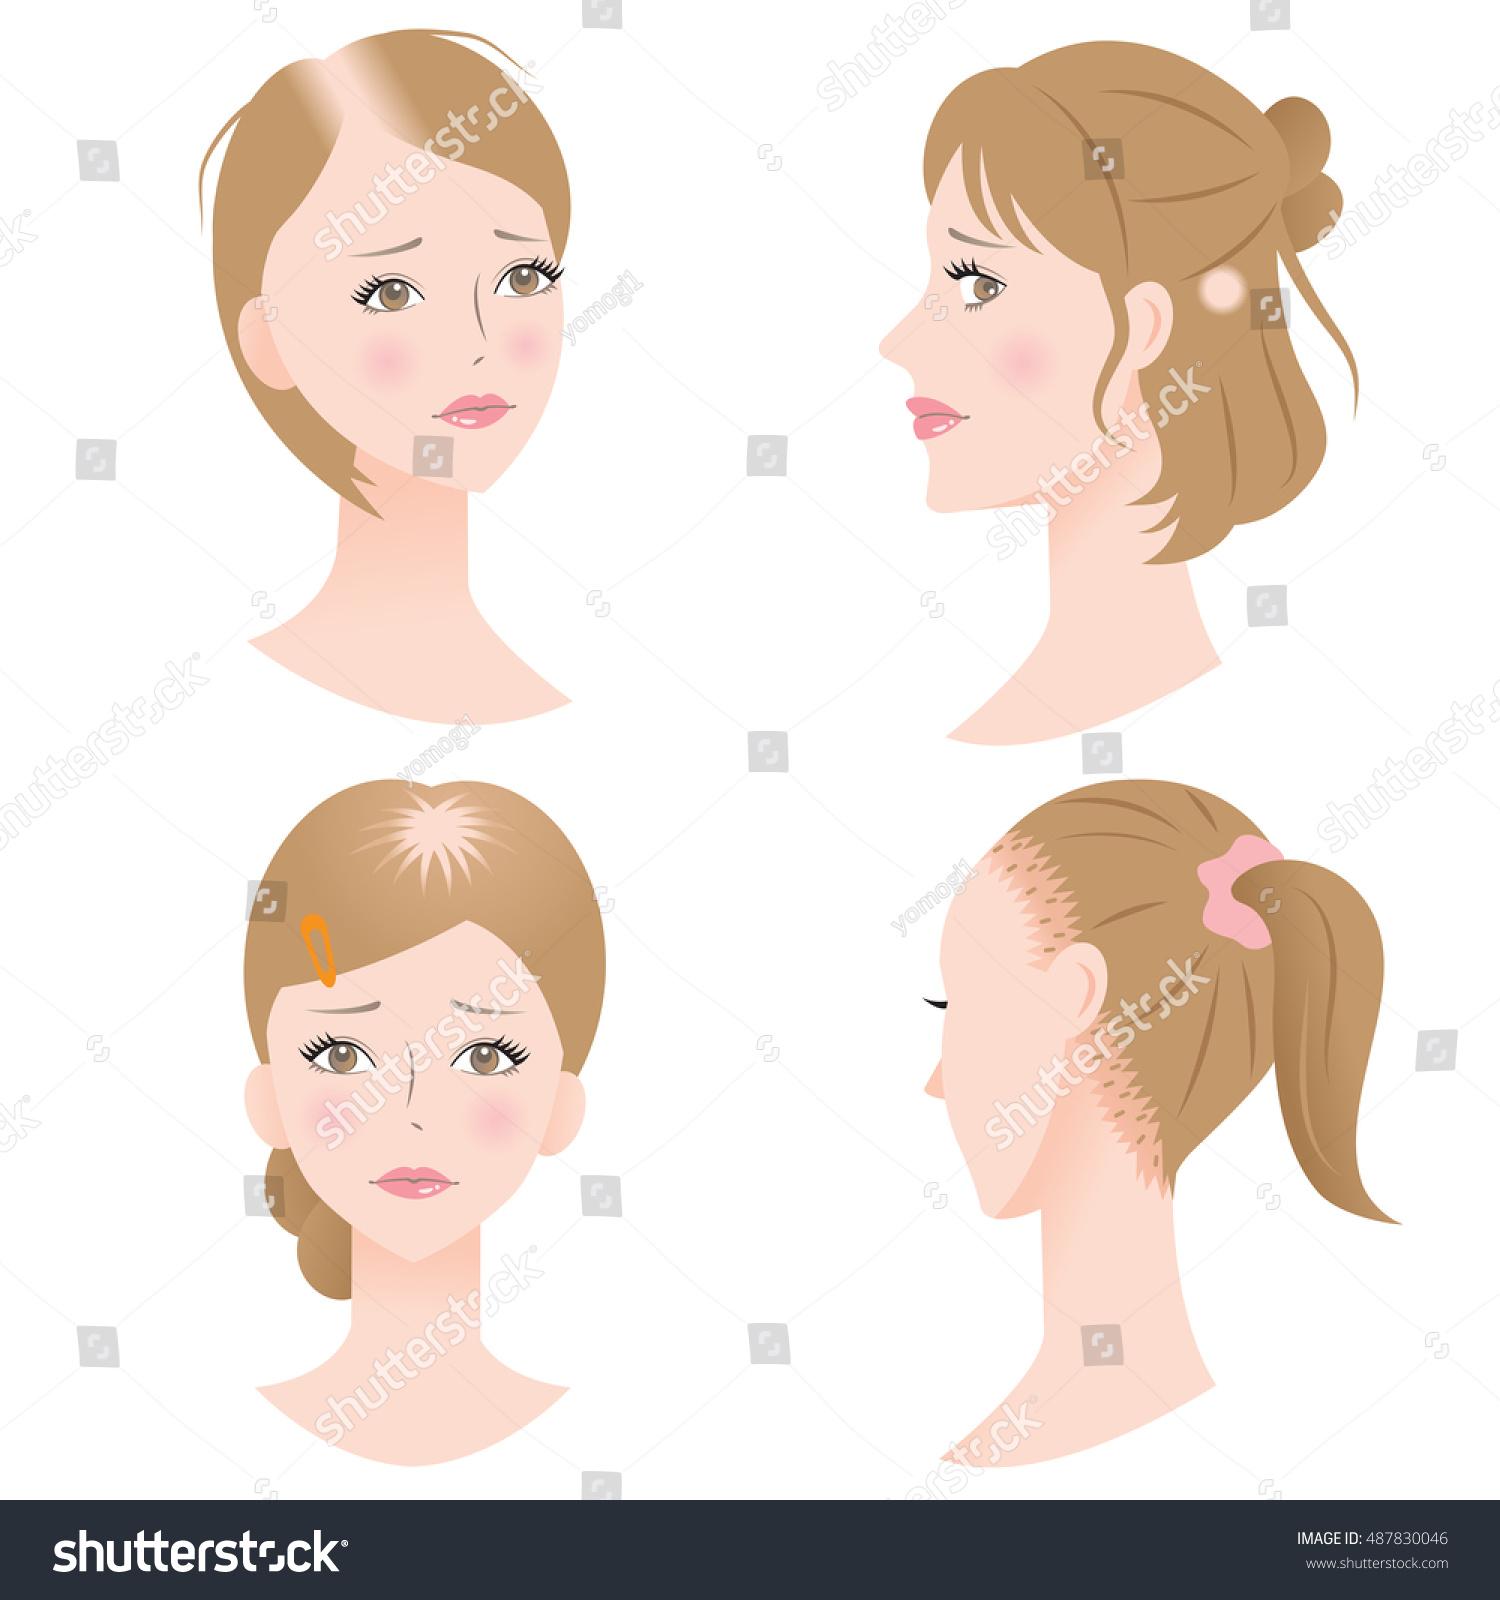 women pattern hair loss get receding stock vector 487830046